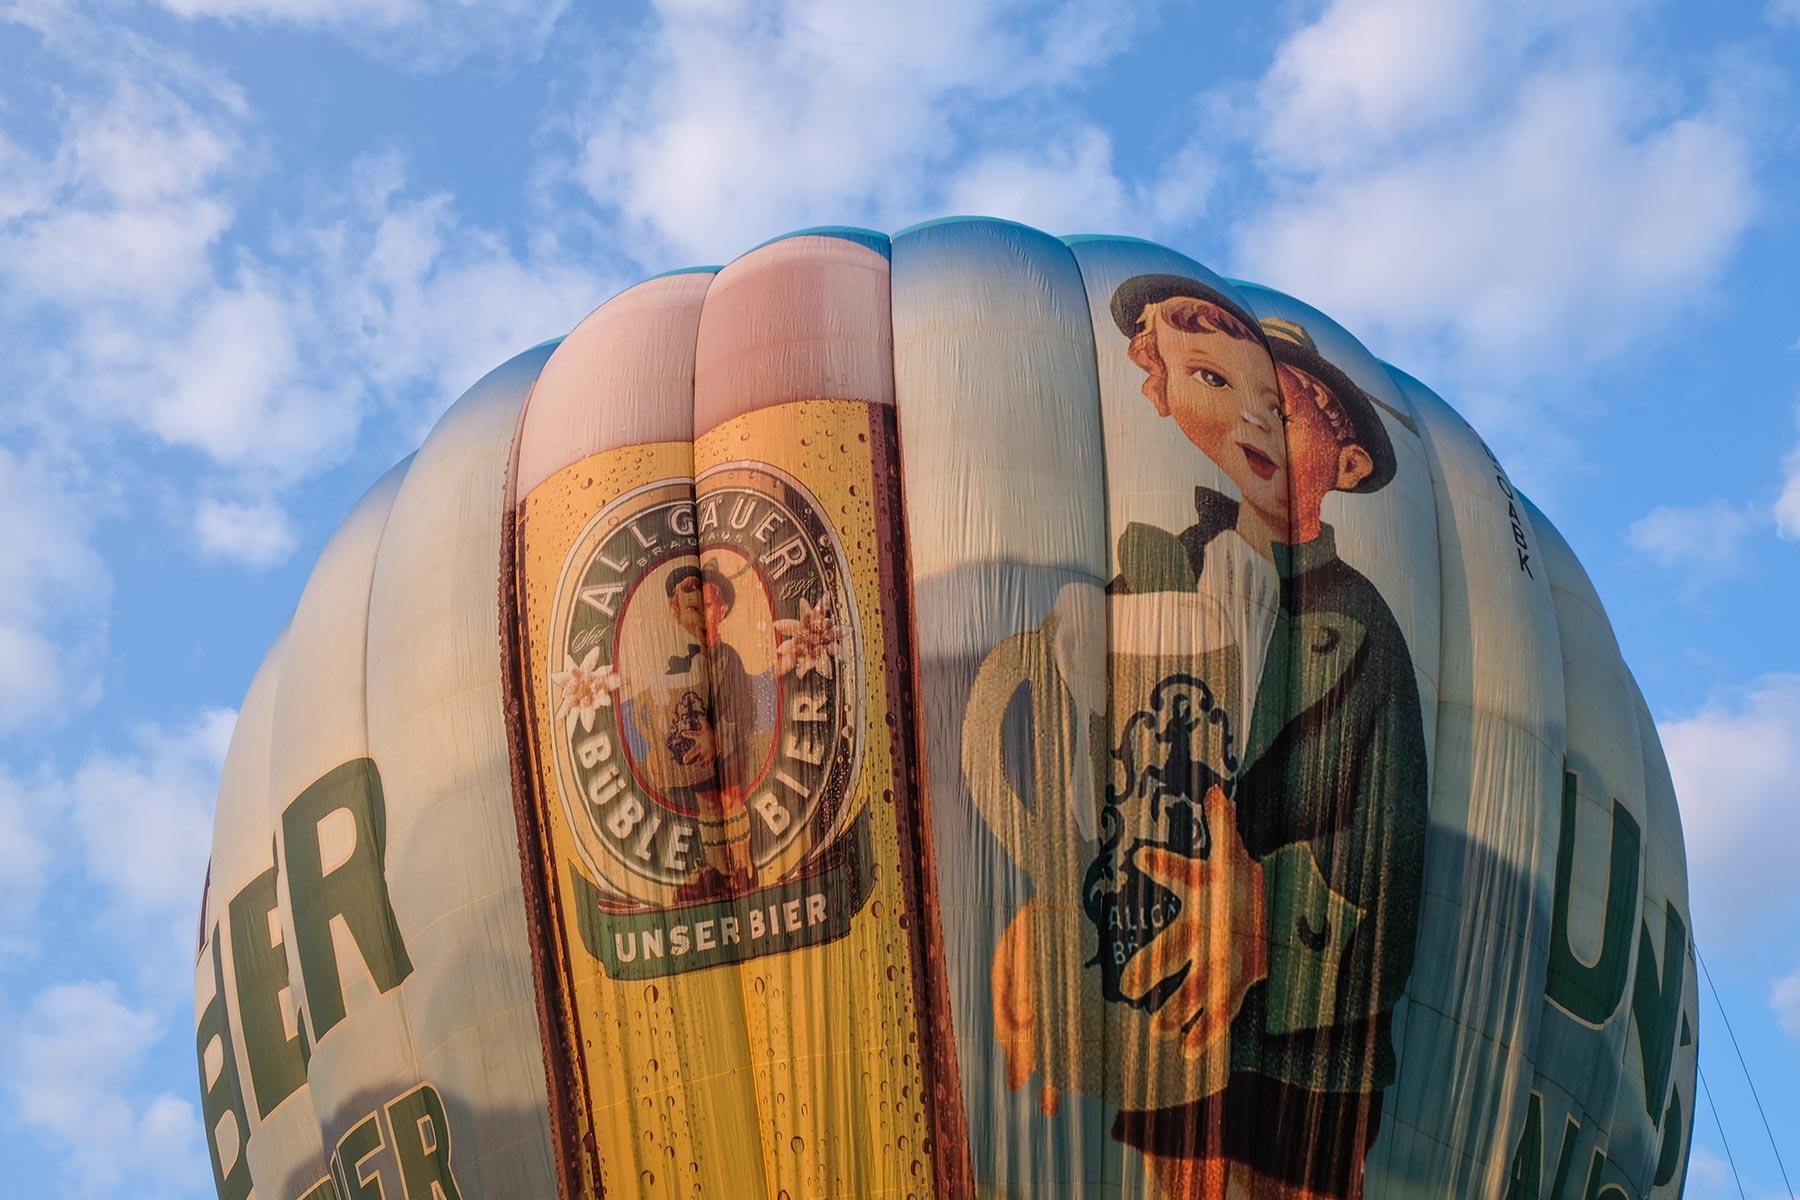 Bavaria Ballon, Allgäuer Büble Bier - Vorbereitungen